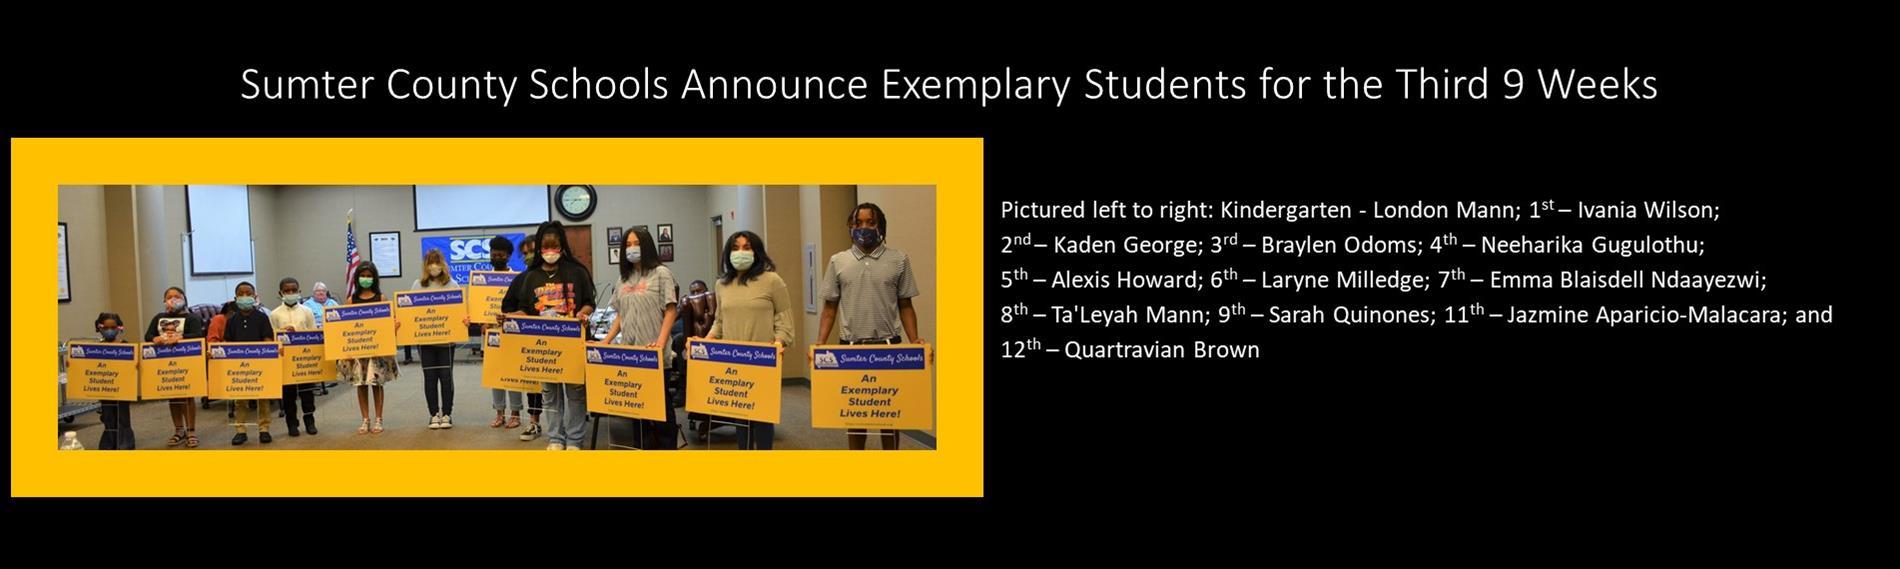 Third Nine Weeks Exemplary Students